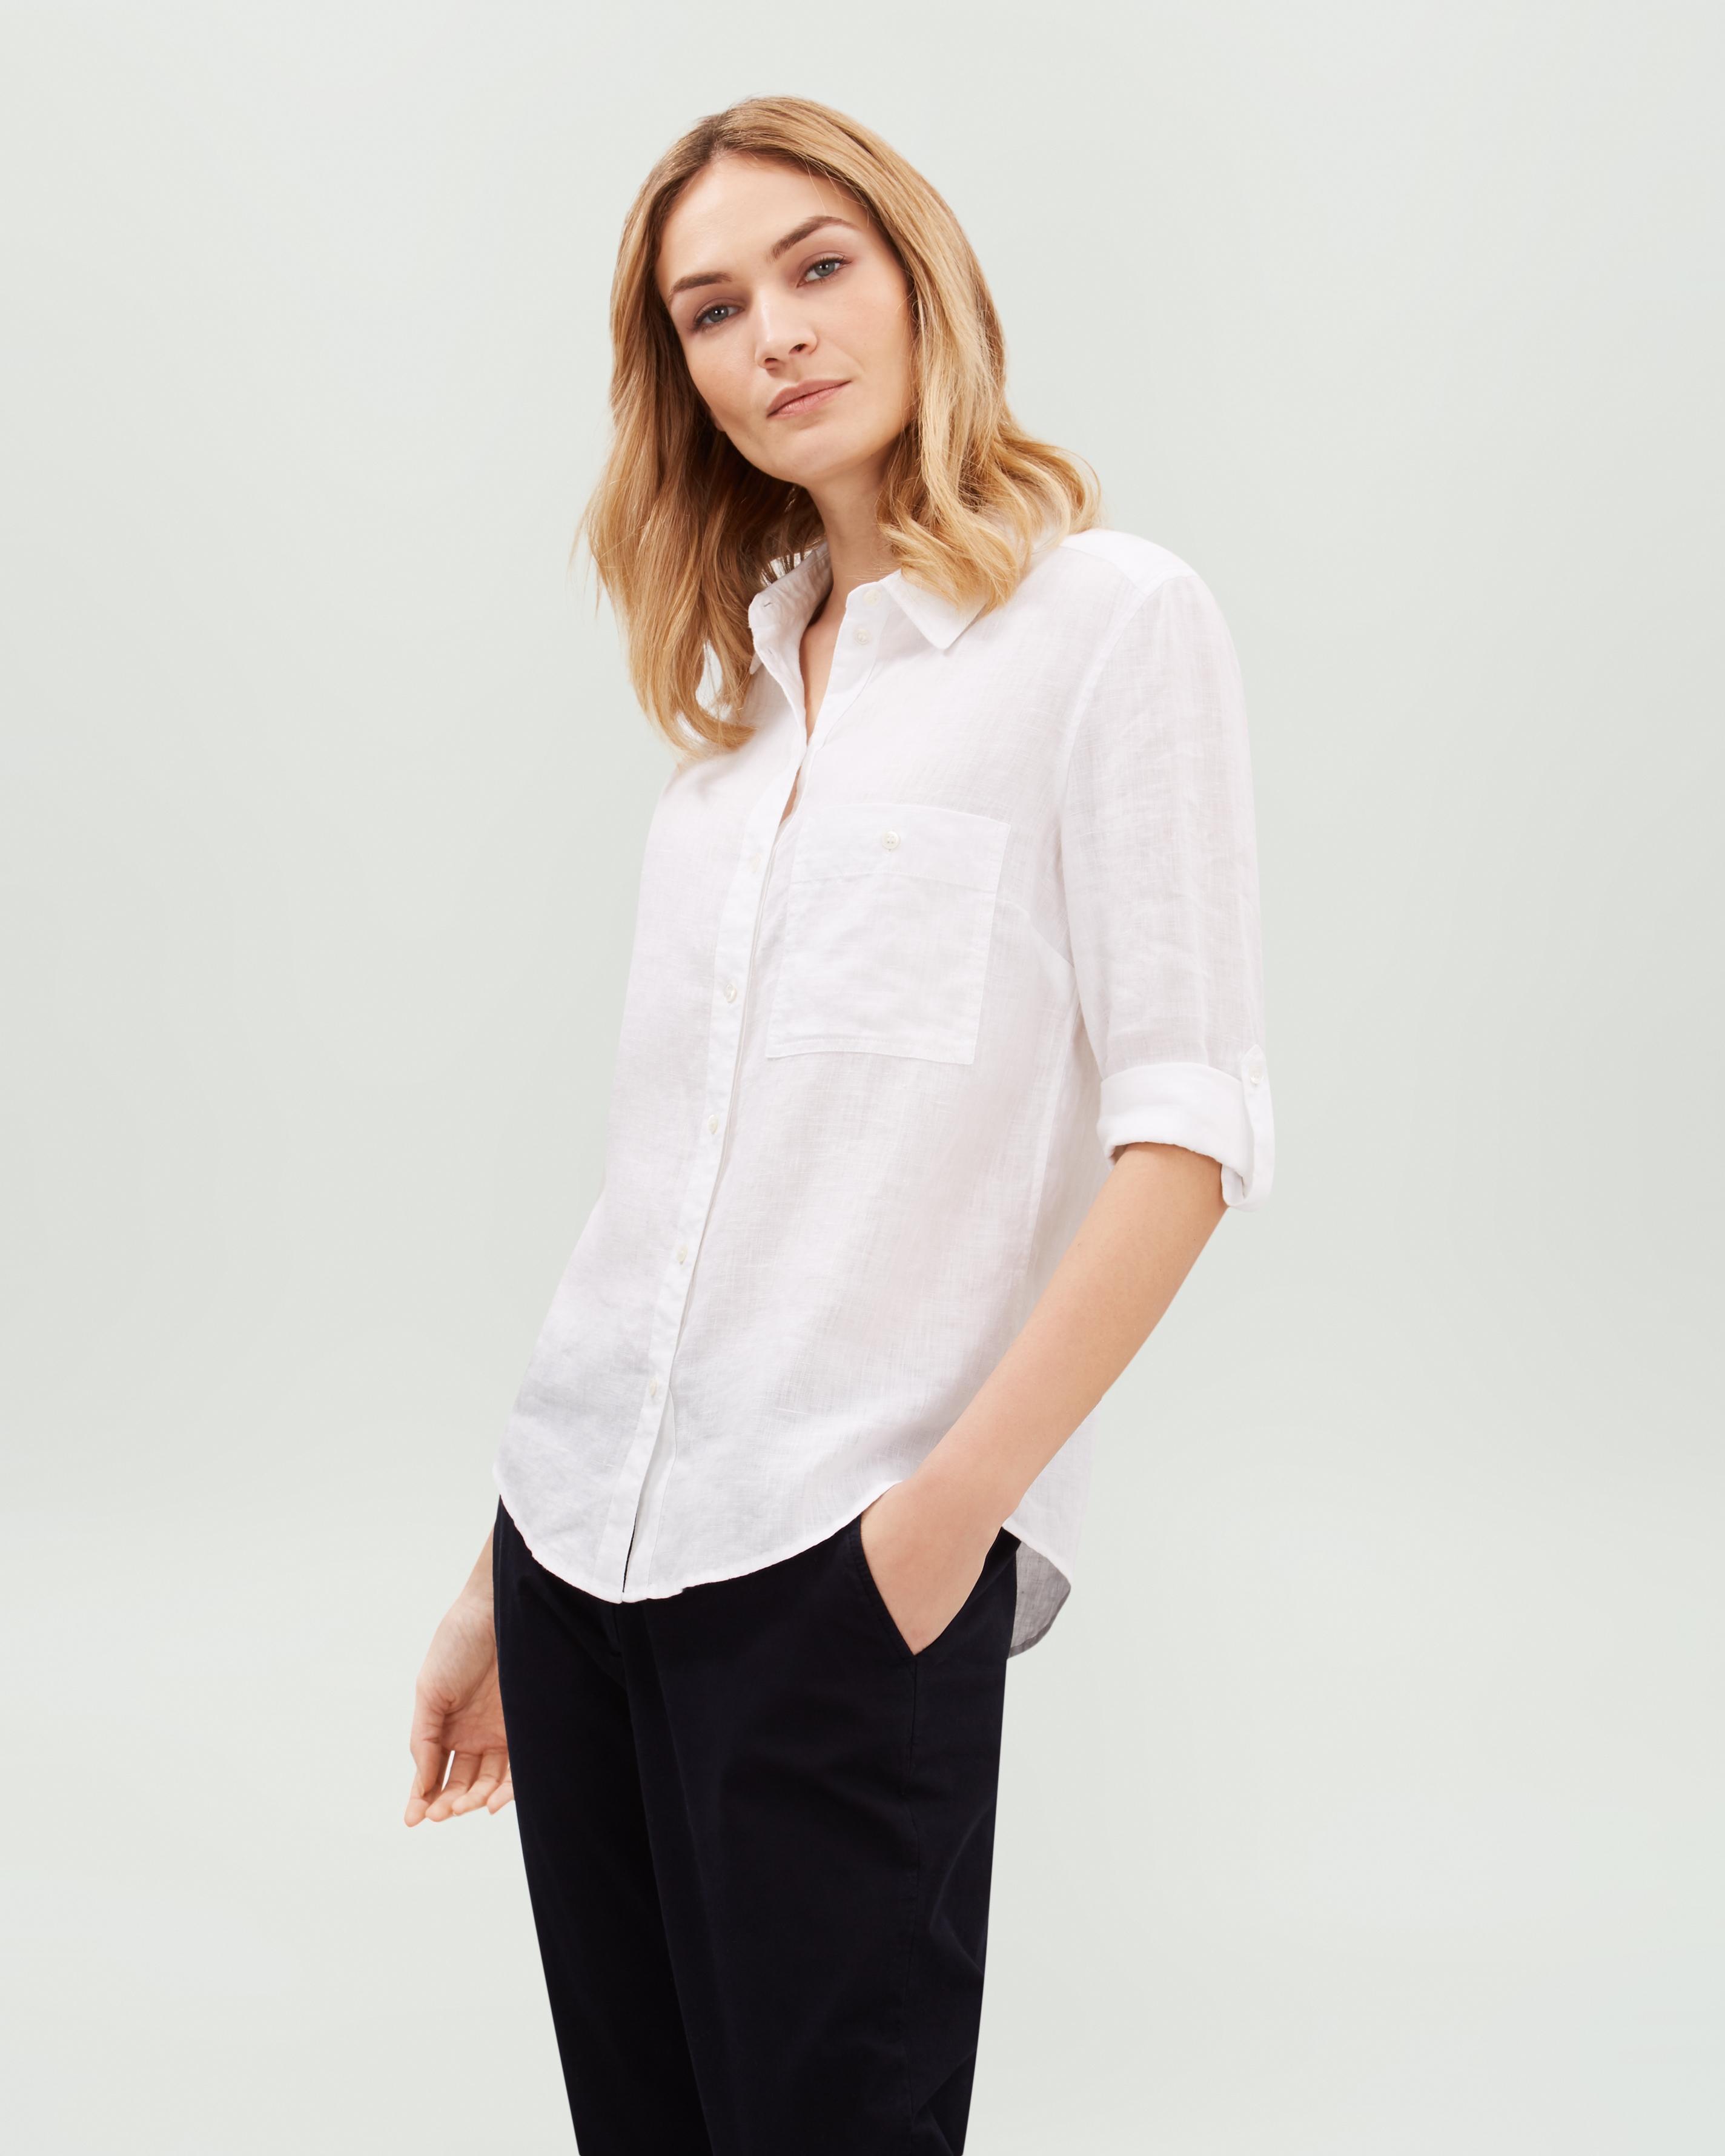 66490a13b8c820 Lyst - Jaeger Linen Roll Sleeve Shirt in White